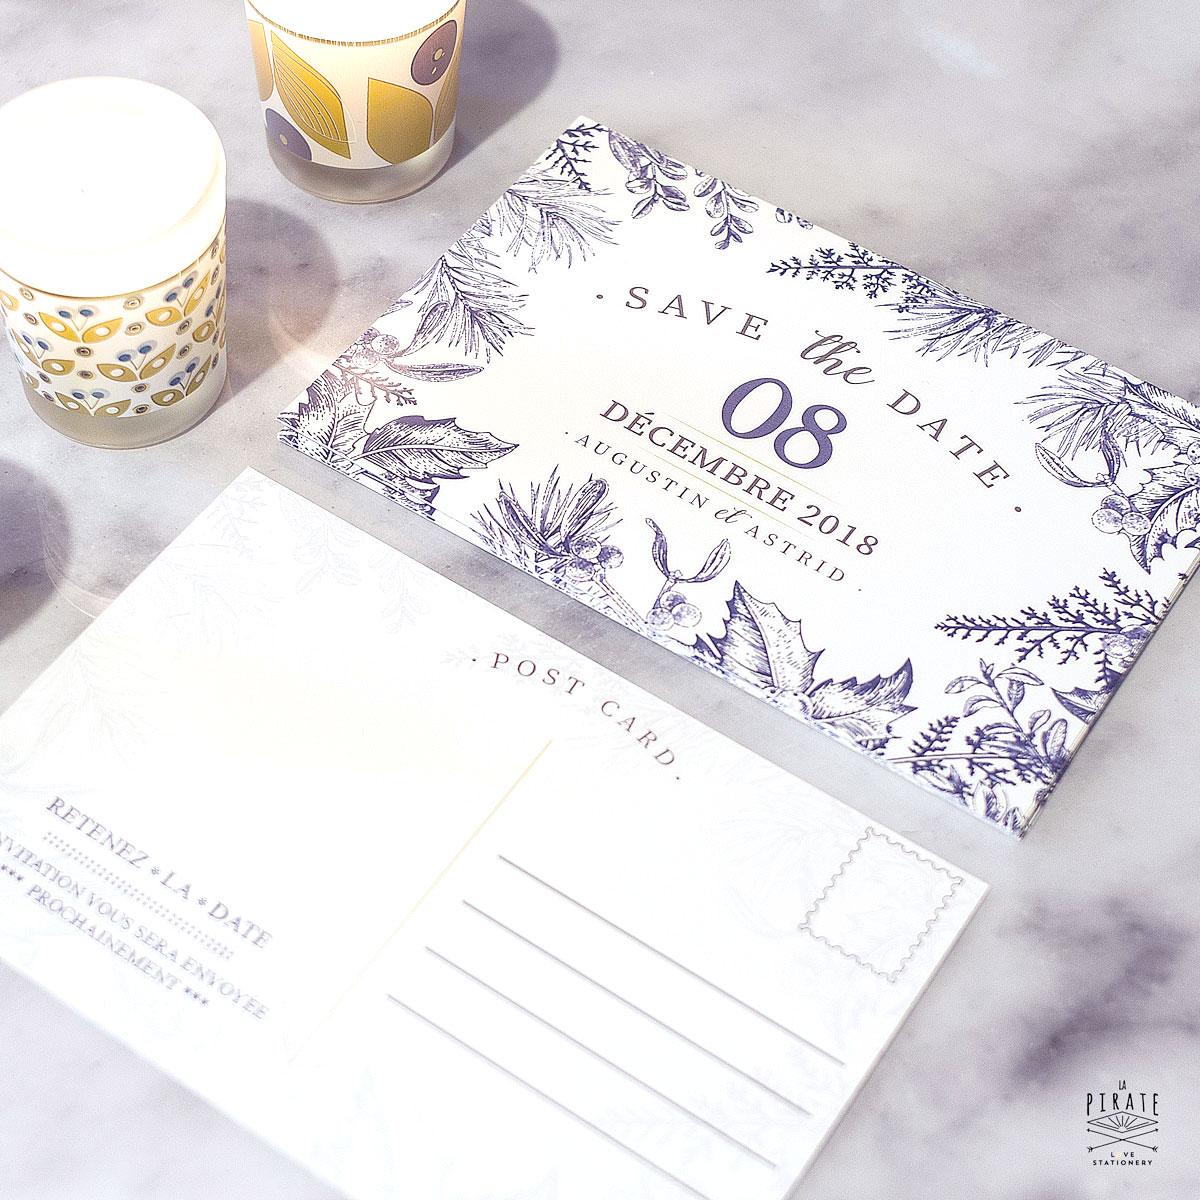 Mariage sans datation OST liste